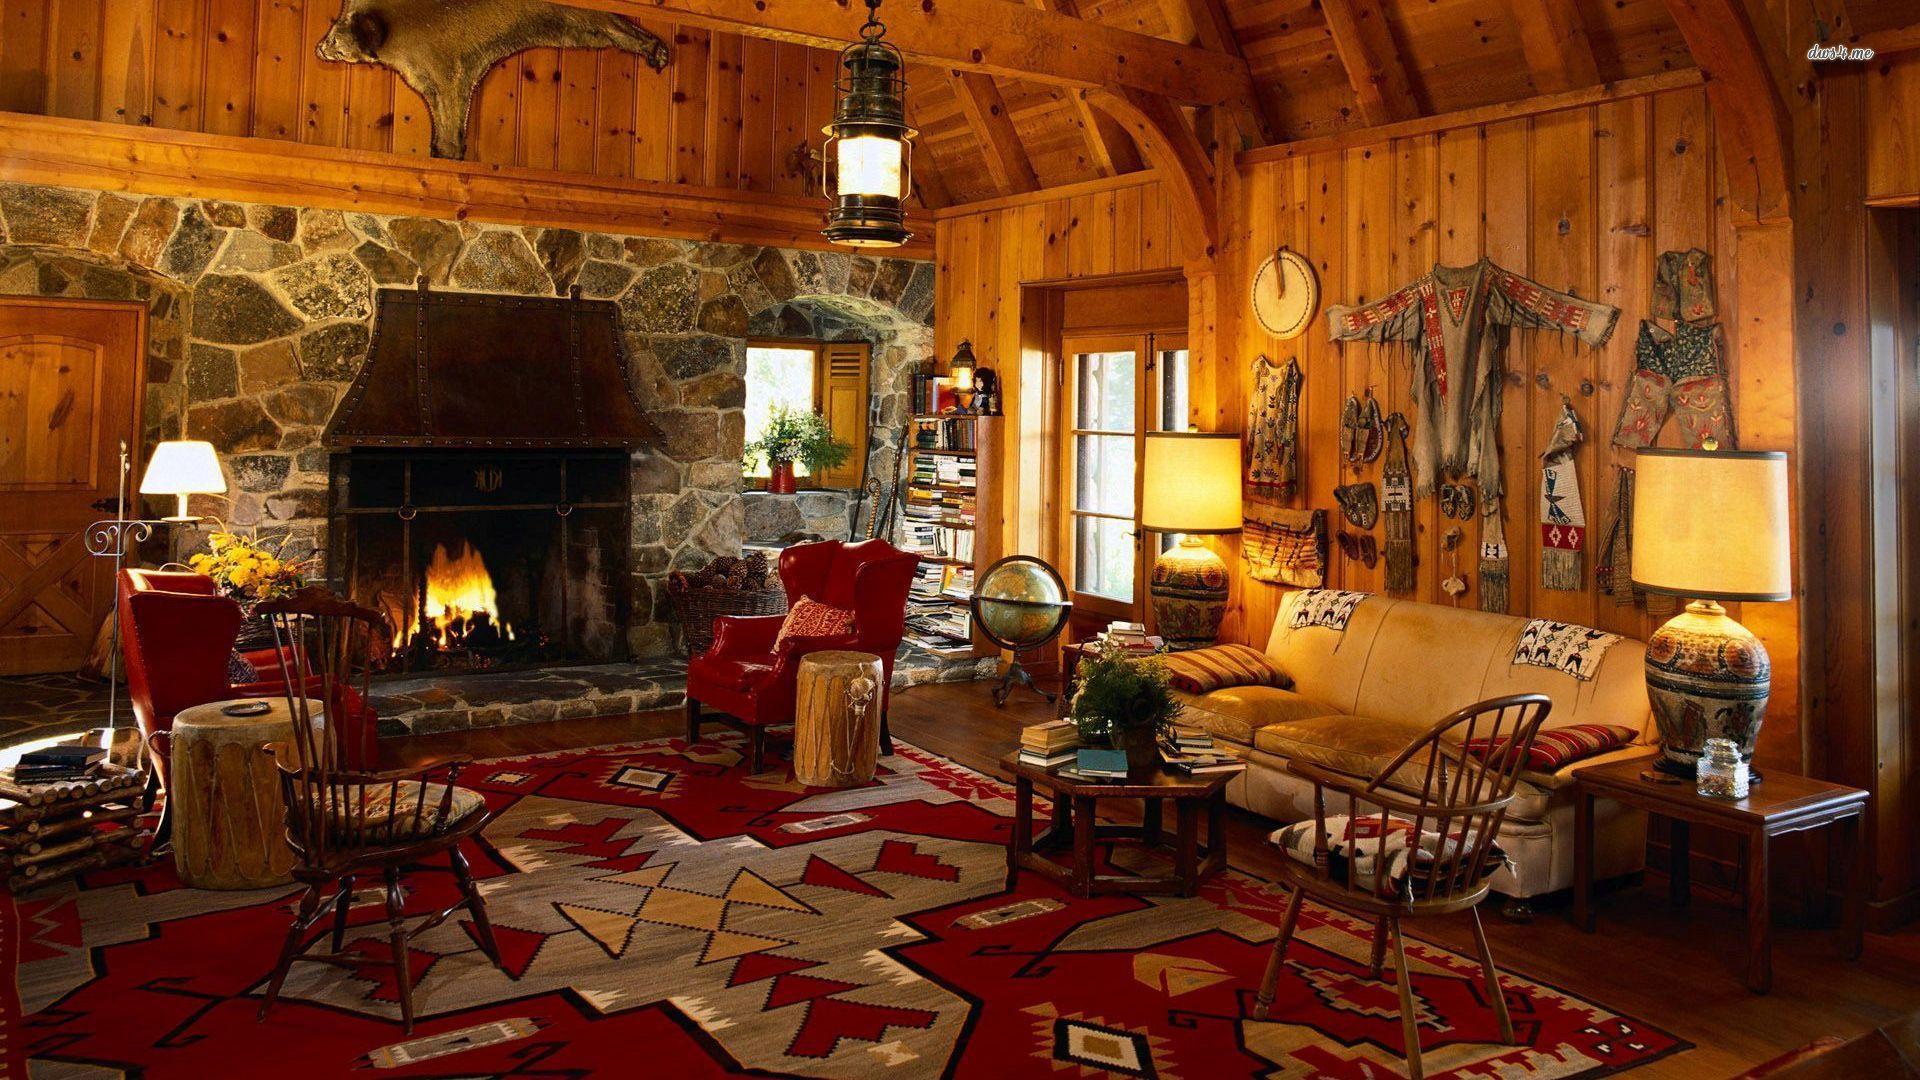 rustic lodge wallpaper wallpapersafari. Black Bedroom Furniture Sets. Home Design Ideas